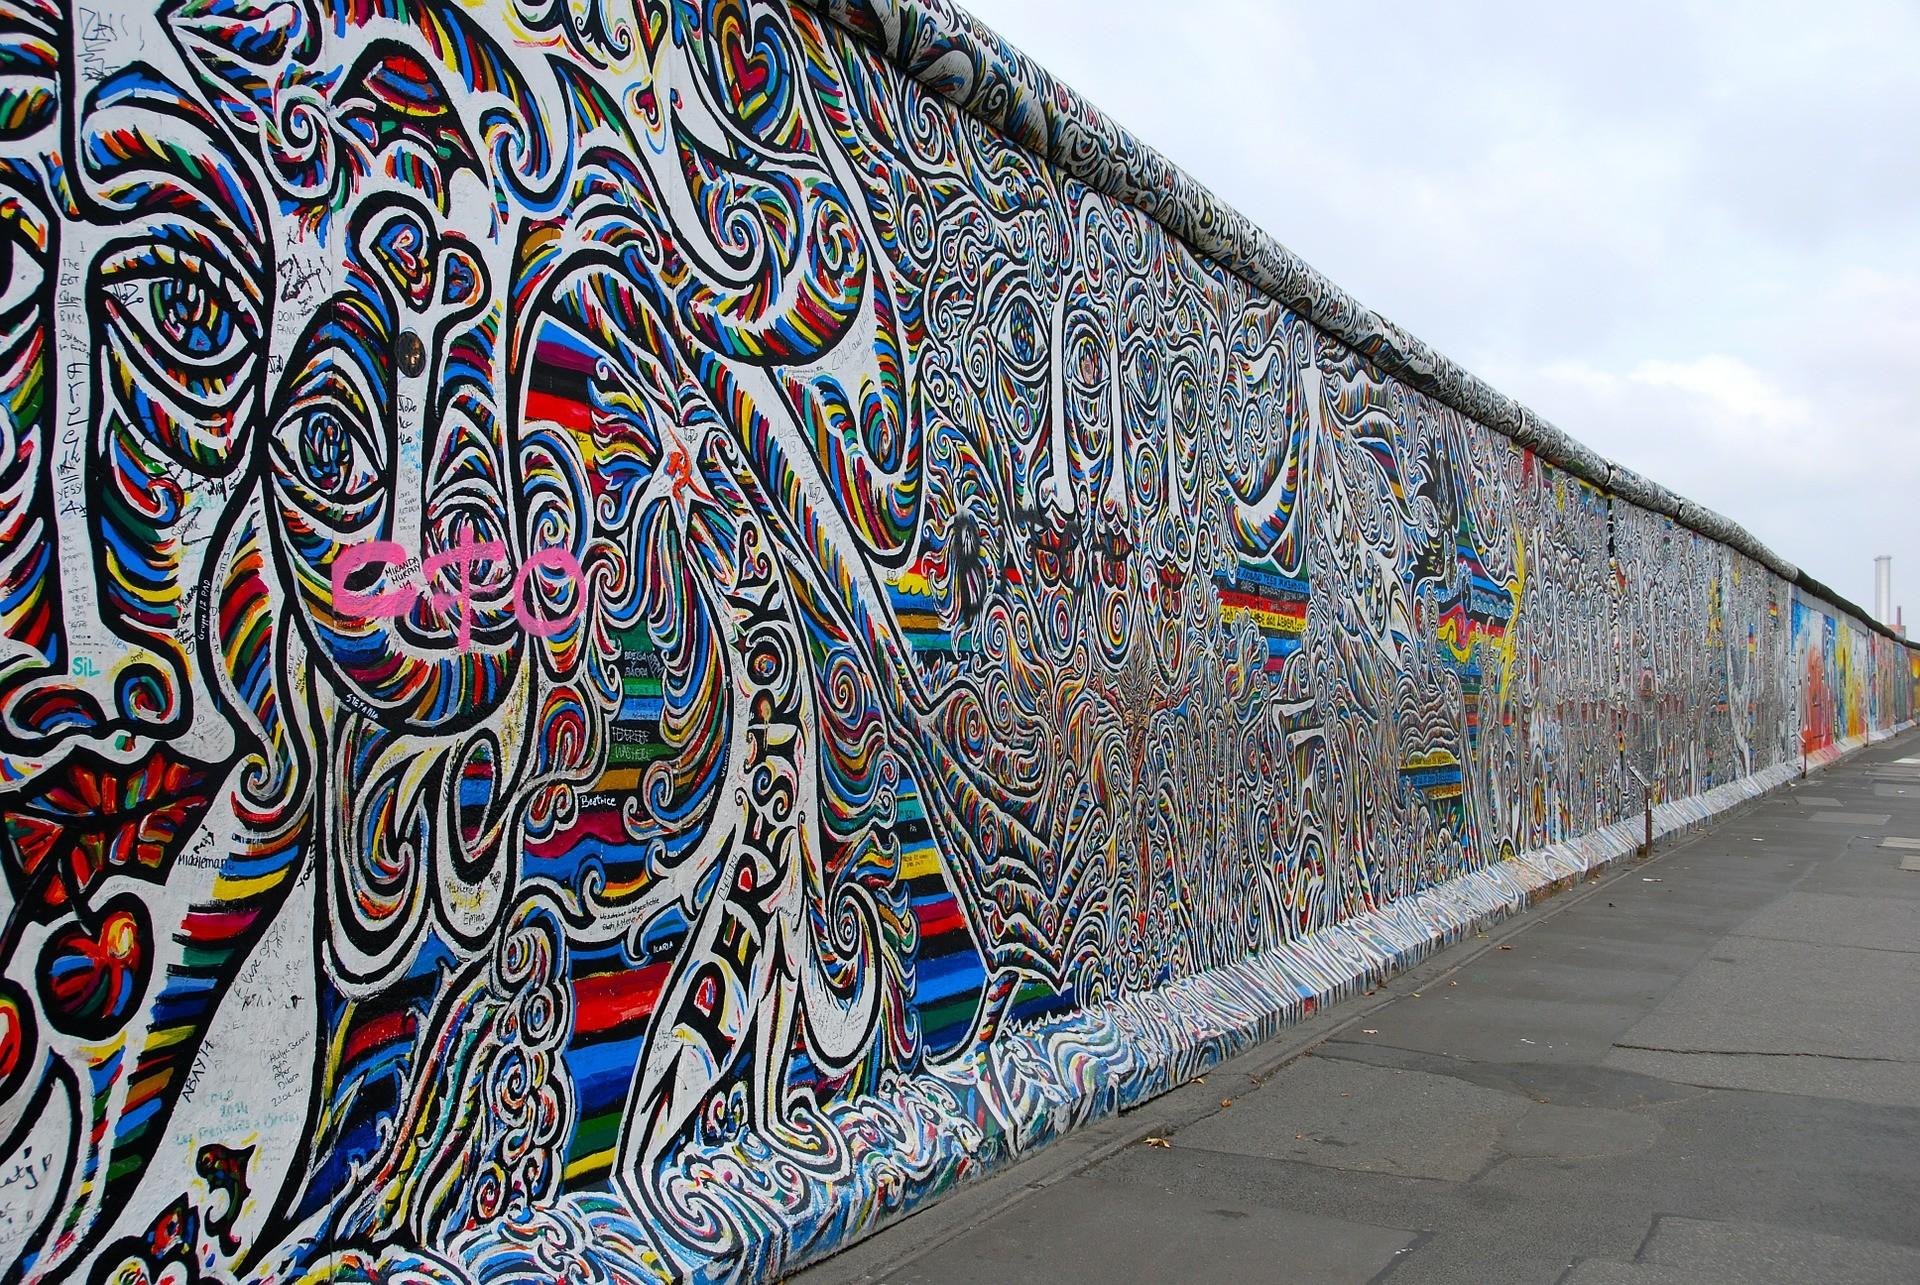 Berlino luoghi di interesse: Muro di Berlino - Foto di MariaTortajada